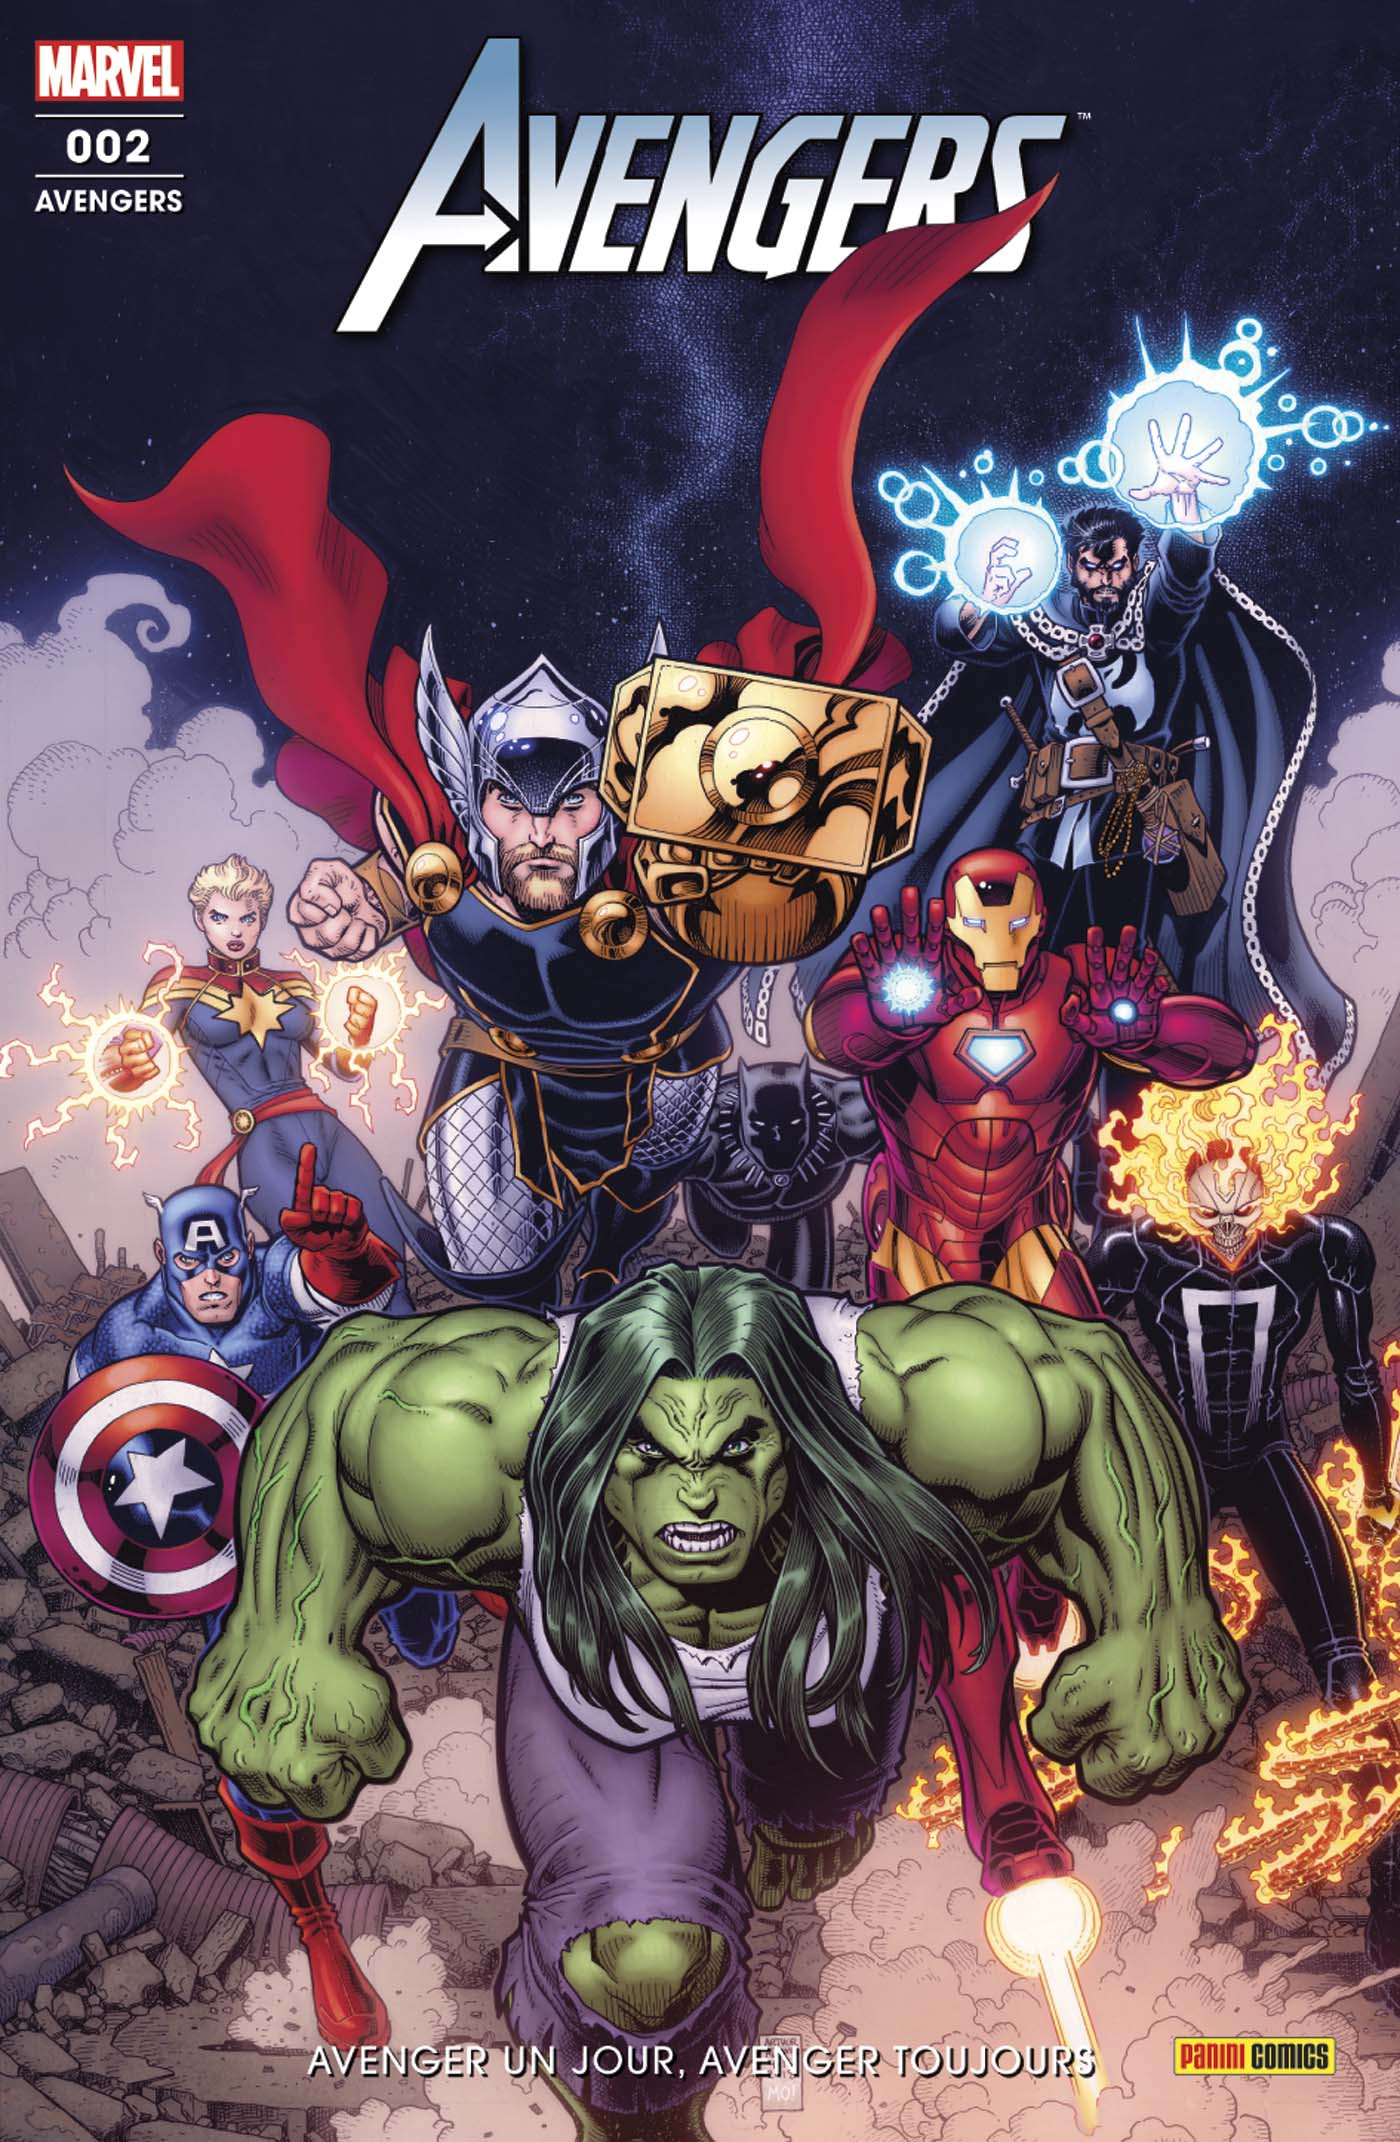 Avengers 2 - Avengers un Jour, Avengers Toujours